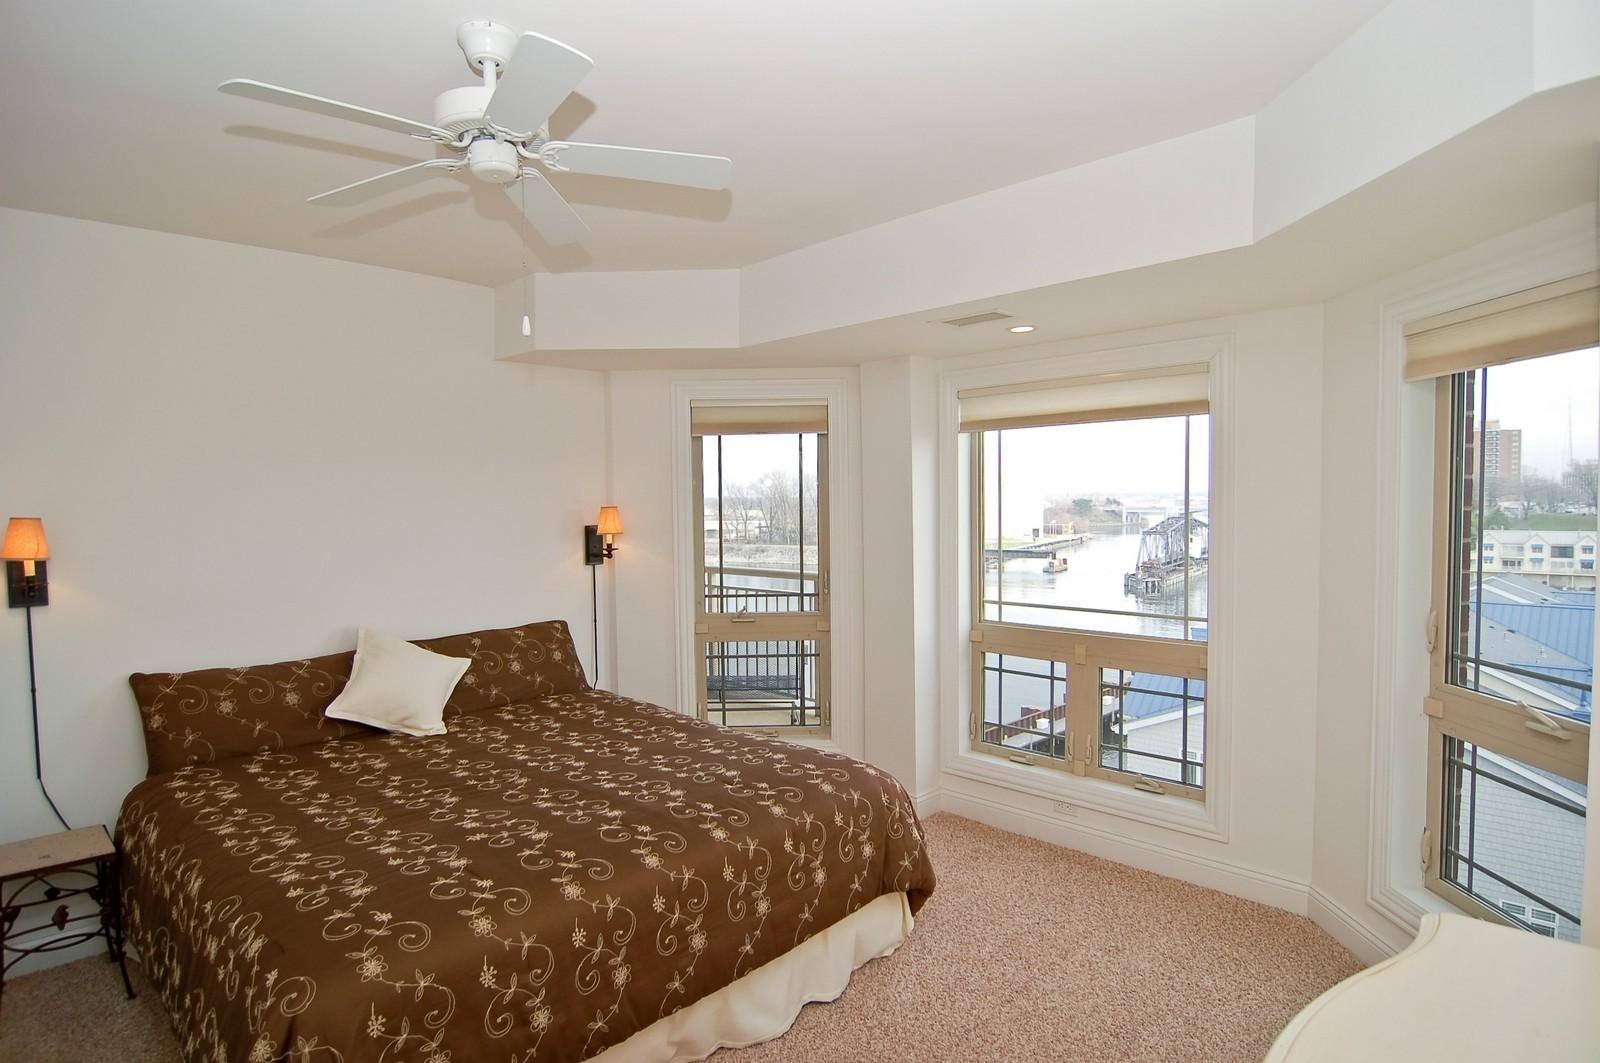 Real Estate Photography - 200- 7B Lake Street, St Joseph, MI, 49085 - 2nd Bedroom